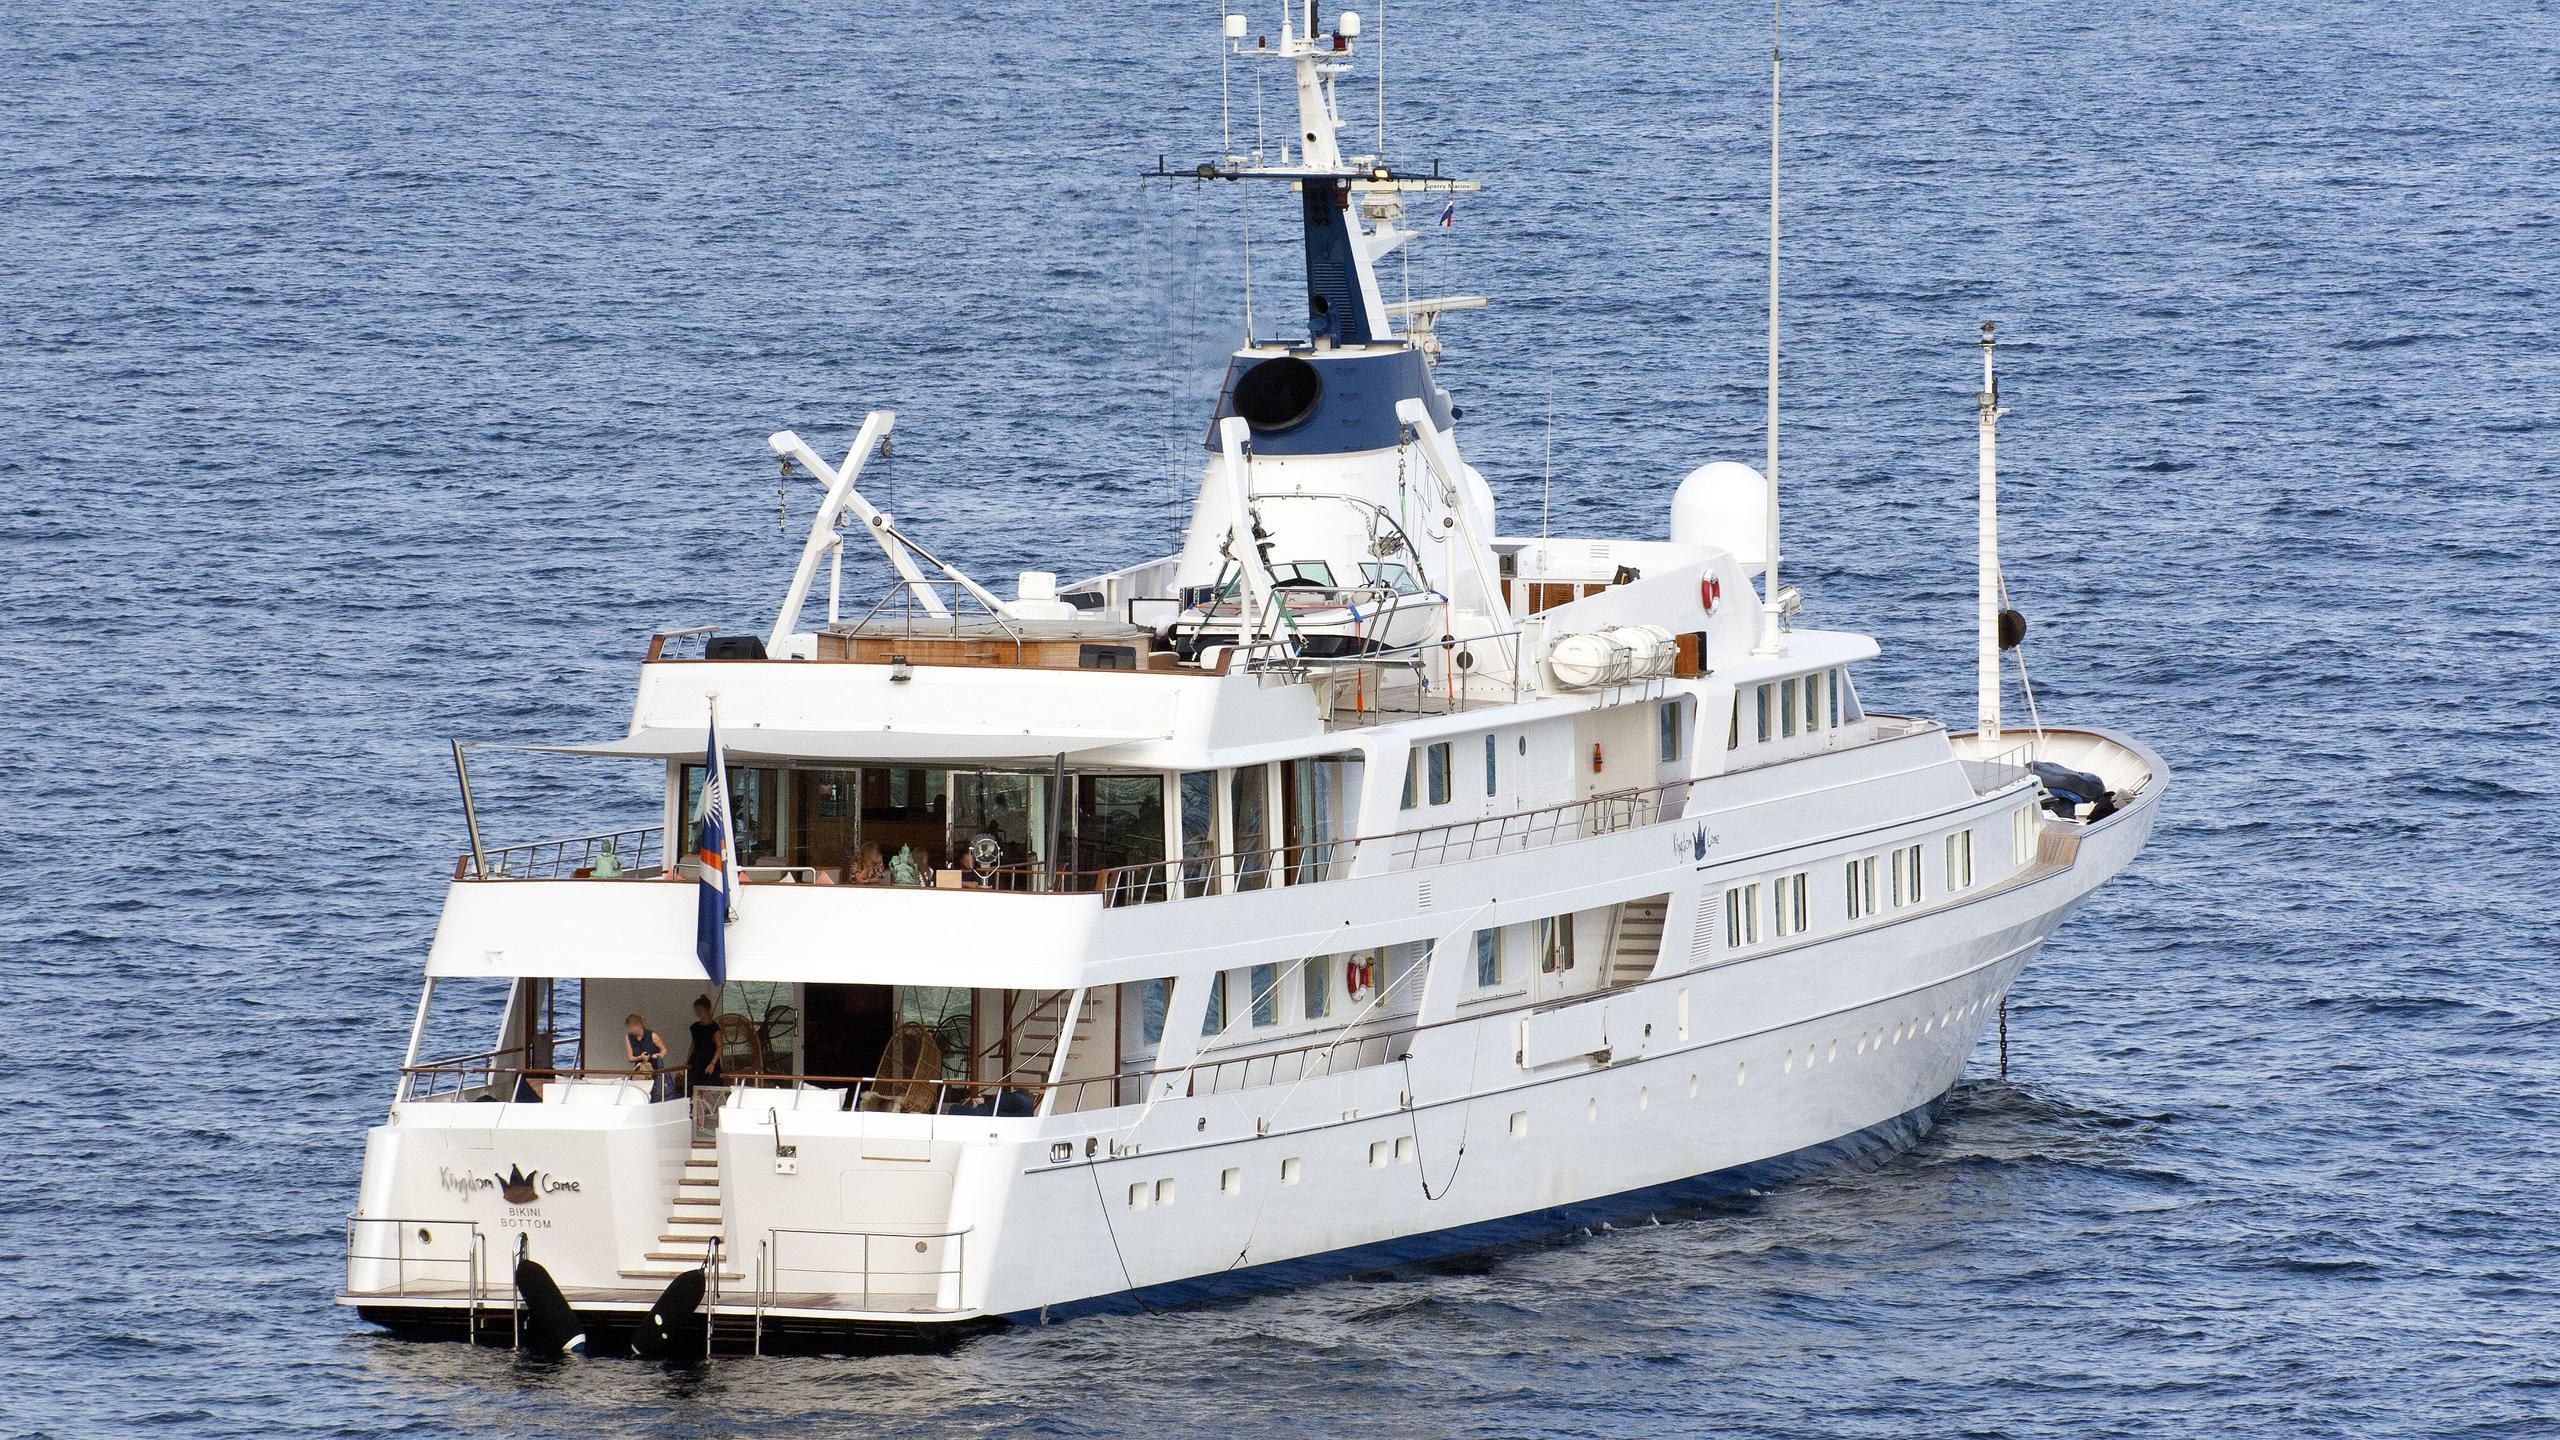 sanoo-kingdom-come-motor-yacht-feadship-1979-61m-stern